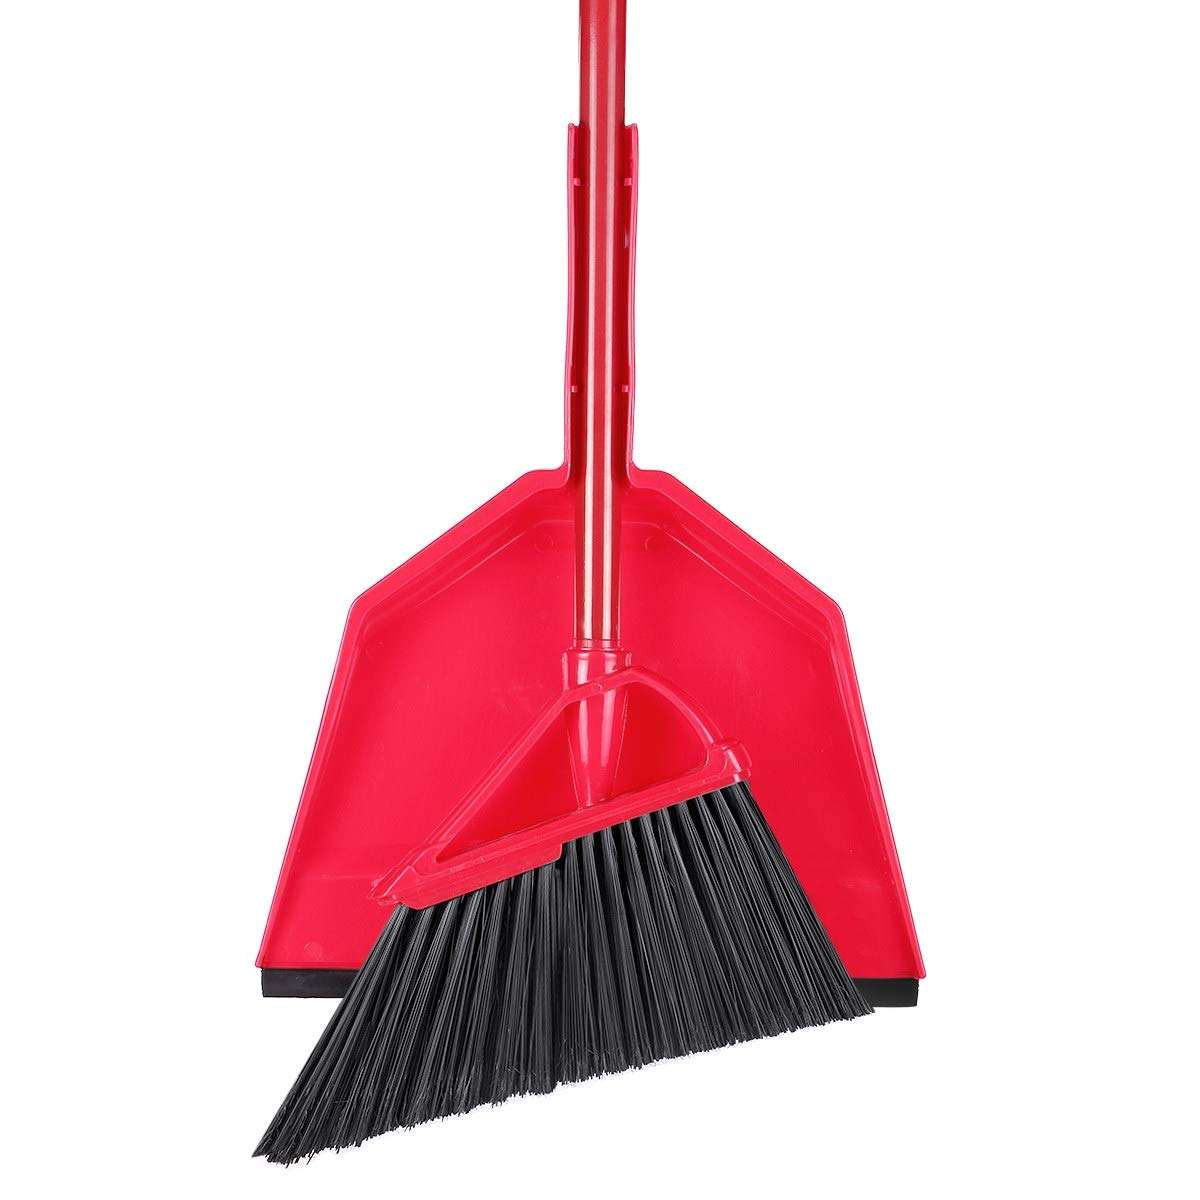 Angle Broom Dustpan Set Rubber Lip Detachable Hand Broom Indoor Outdoor Floor Sweeper Lobby Kitchen Patio Garden Garage Shop Hair Salon by Iamagie (Image #9)